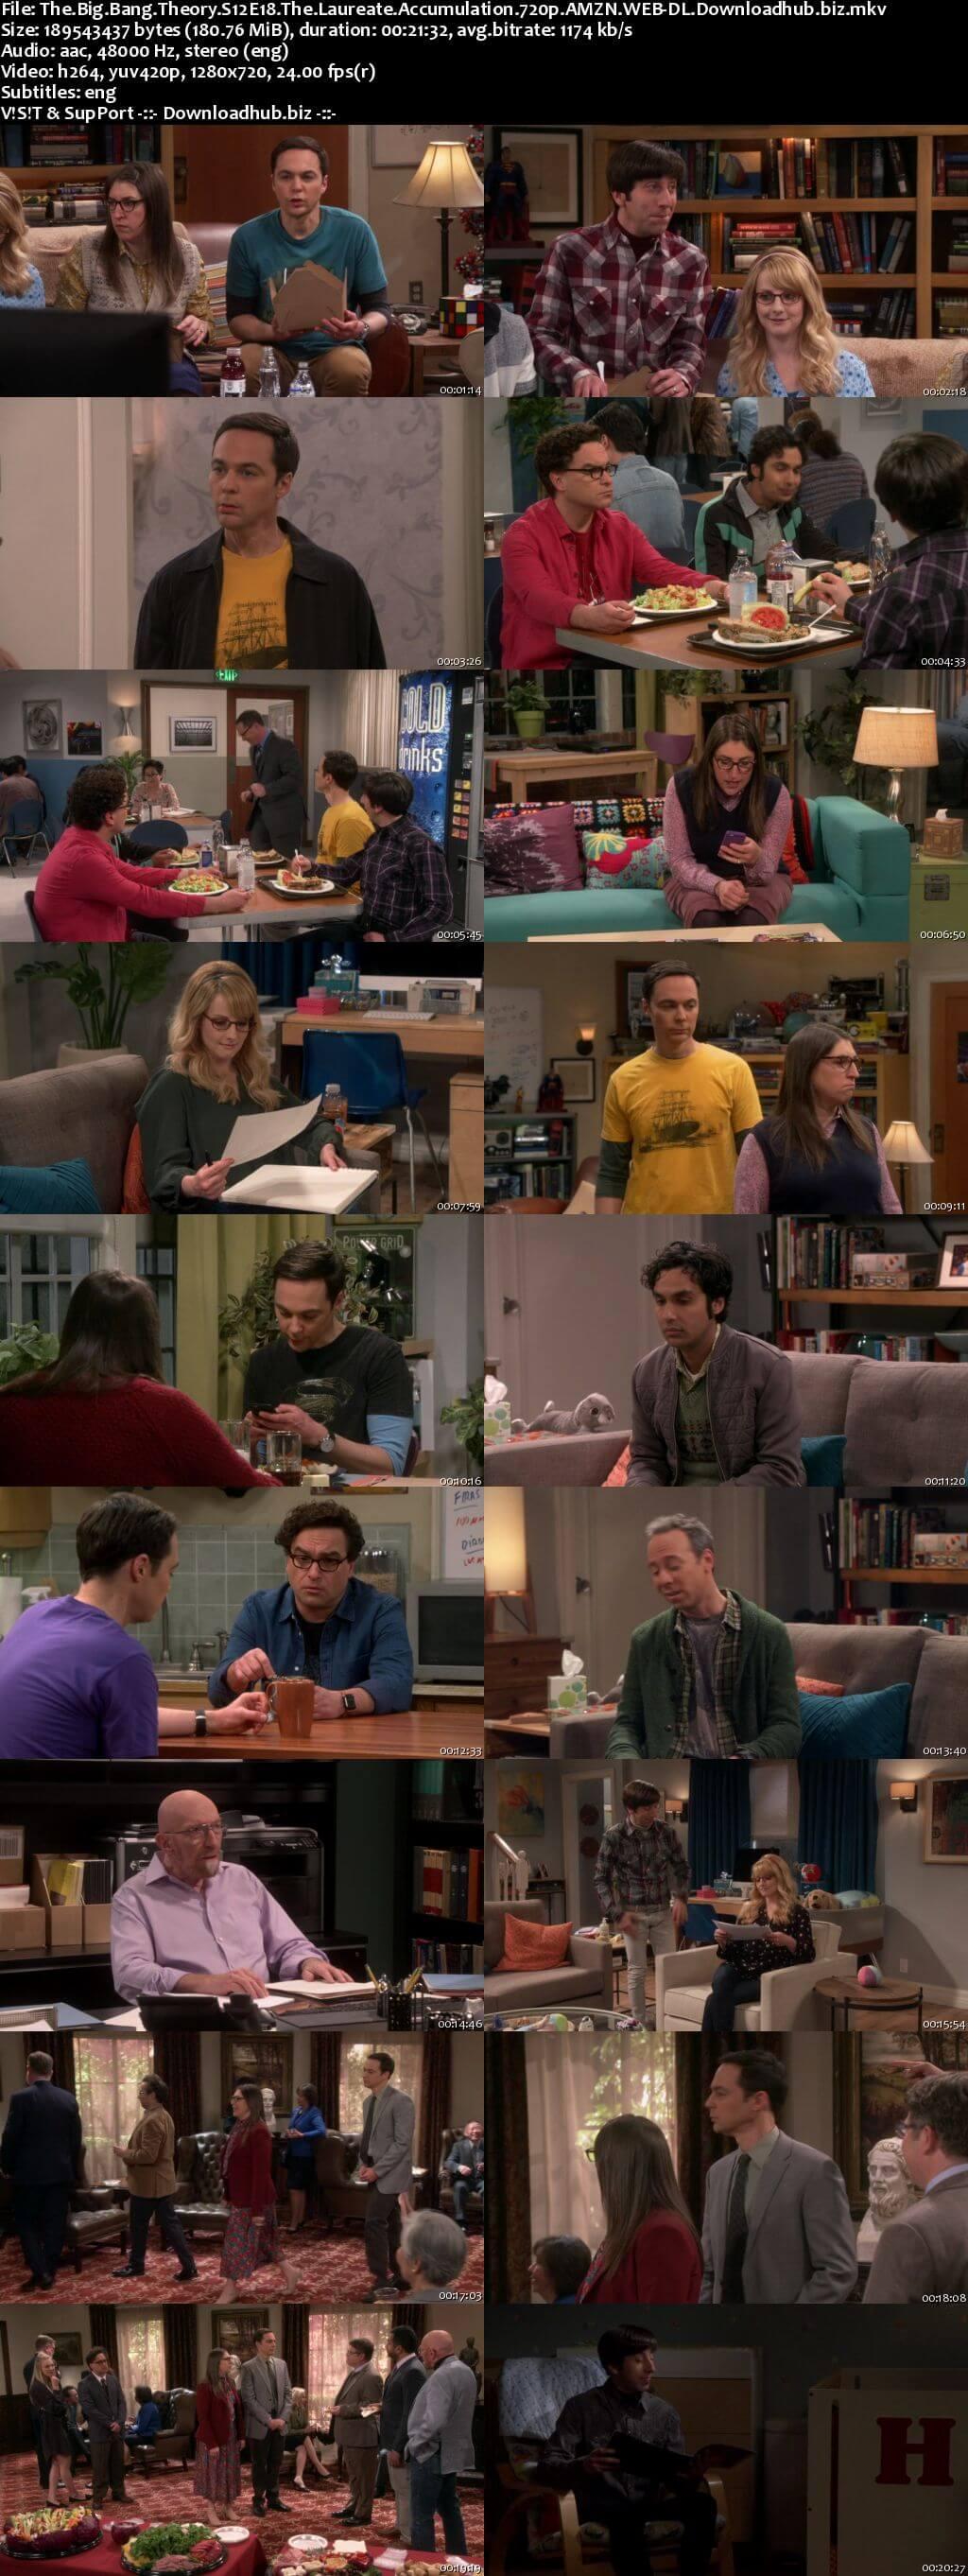 The Big Bang Theory S12E18 180MB AMZN WEB-DL 720p ESubs